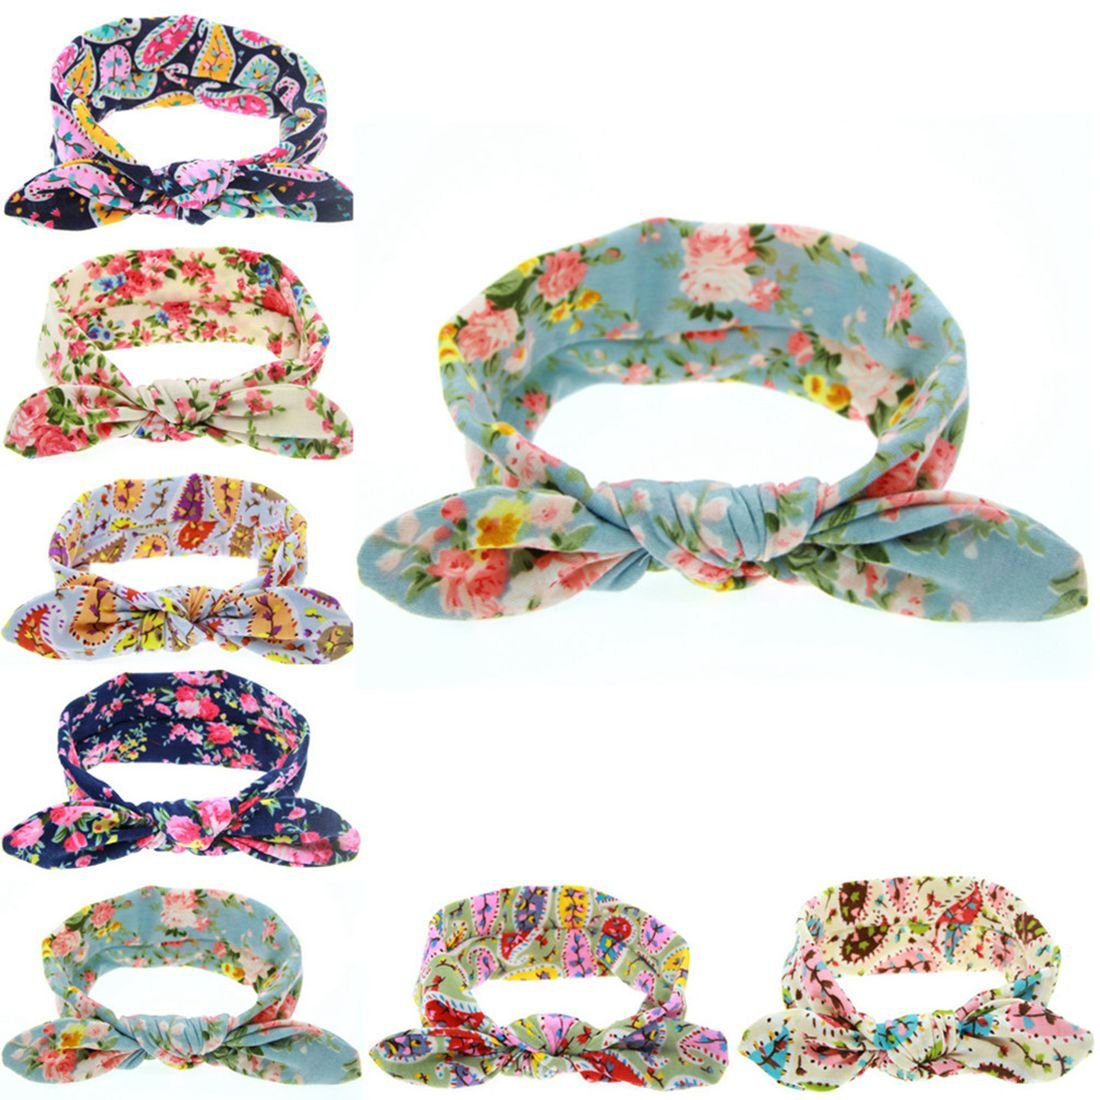 Baby Girl Headband Bunny Ears Floral Girls' Head Wrap Turban Baby Headband 8 Pcs Yzjcafriz